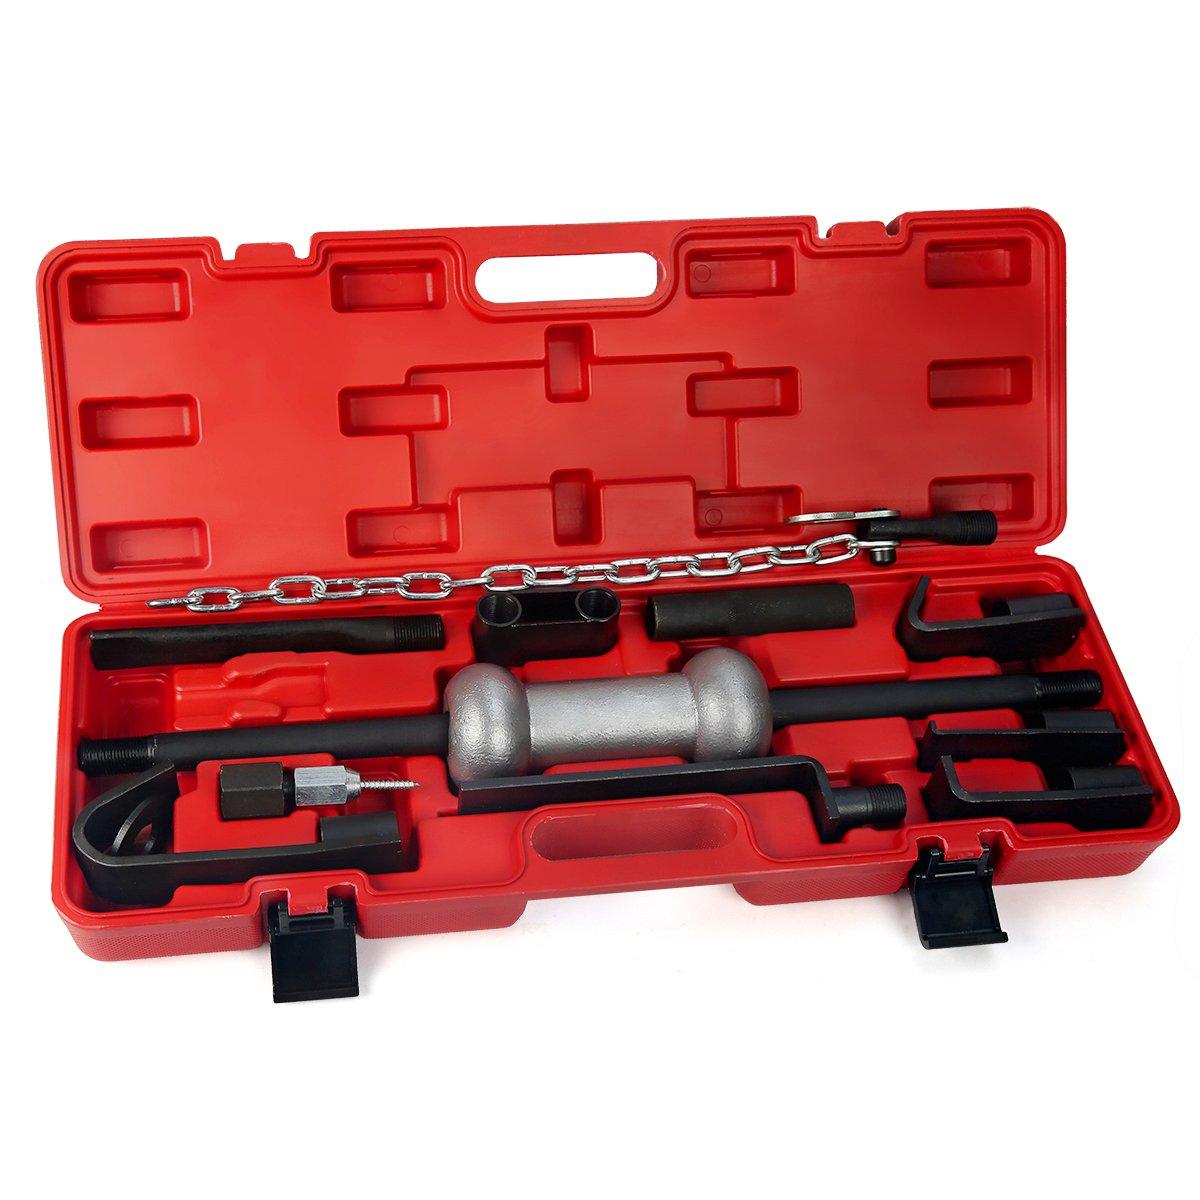 XtremepowerUS Heavy Duty 13 Pc. 10 Lb. Dent Puller Body Set Tool Kit